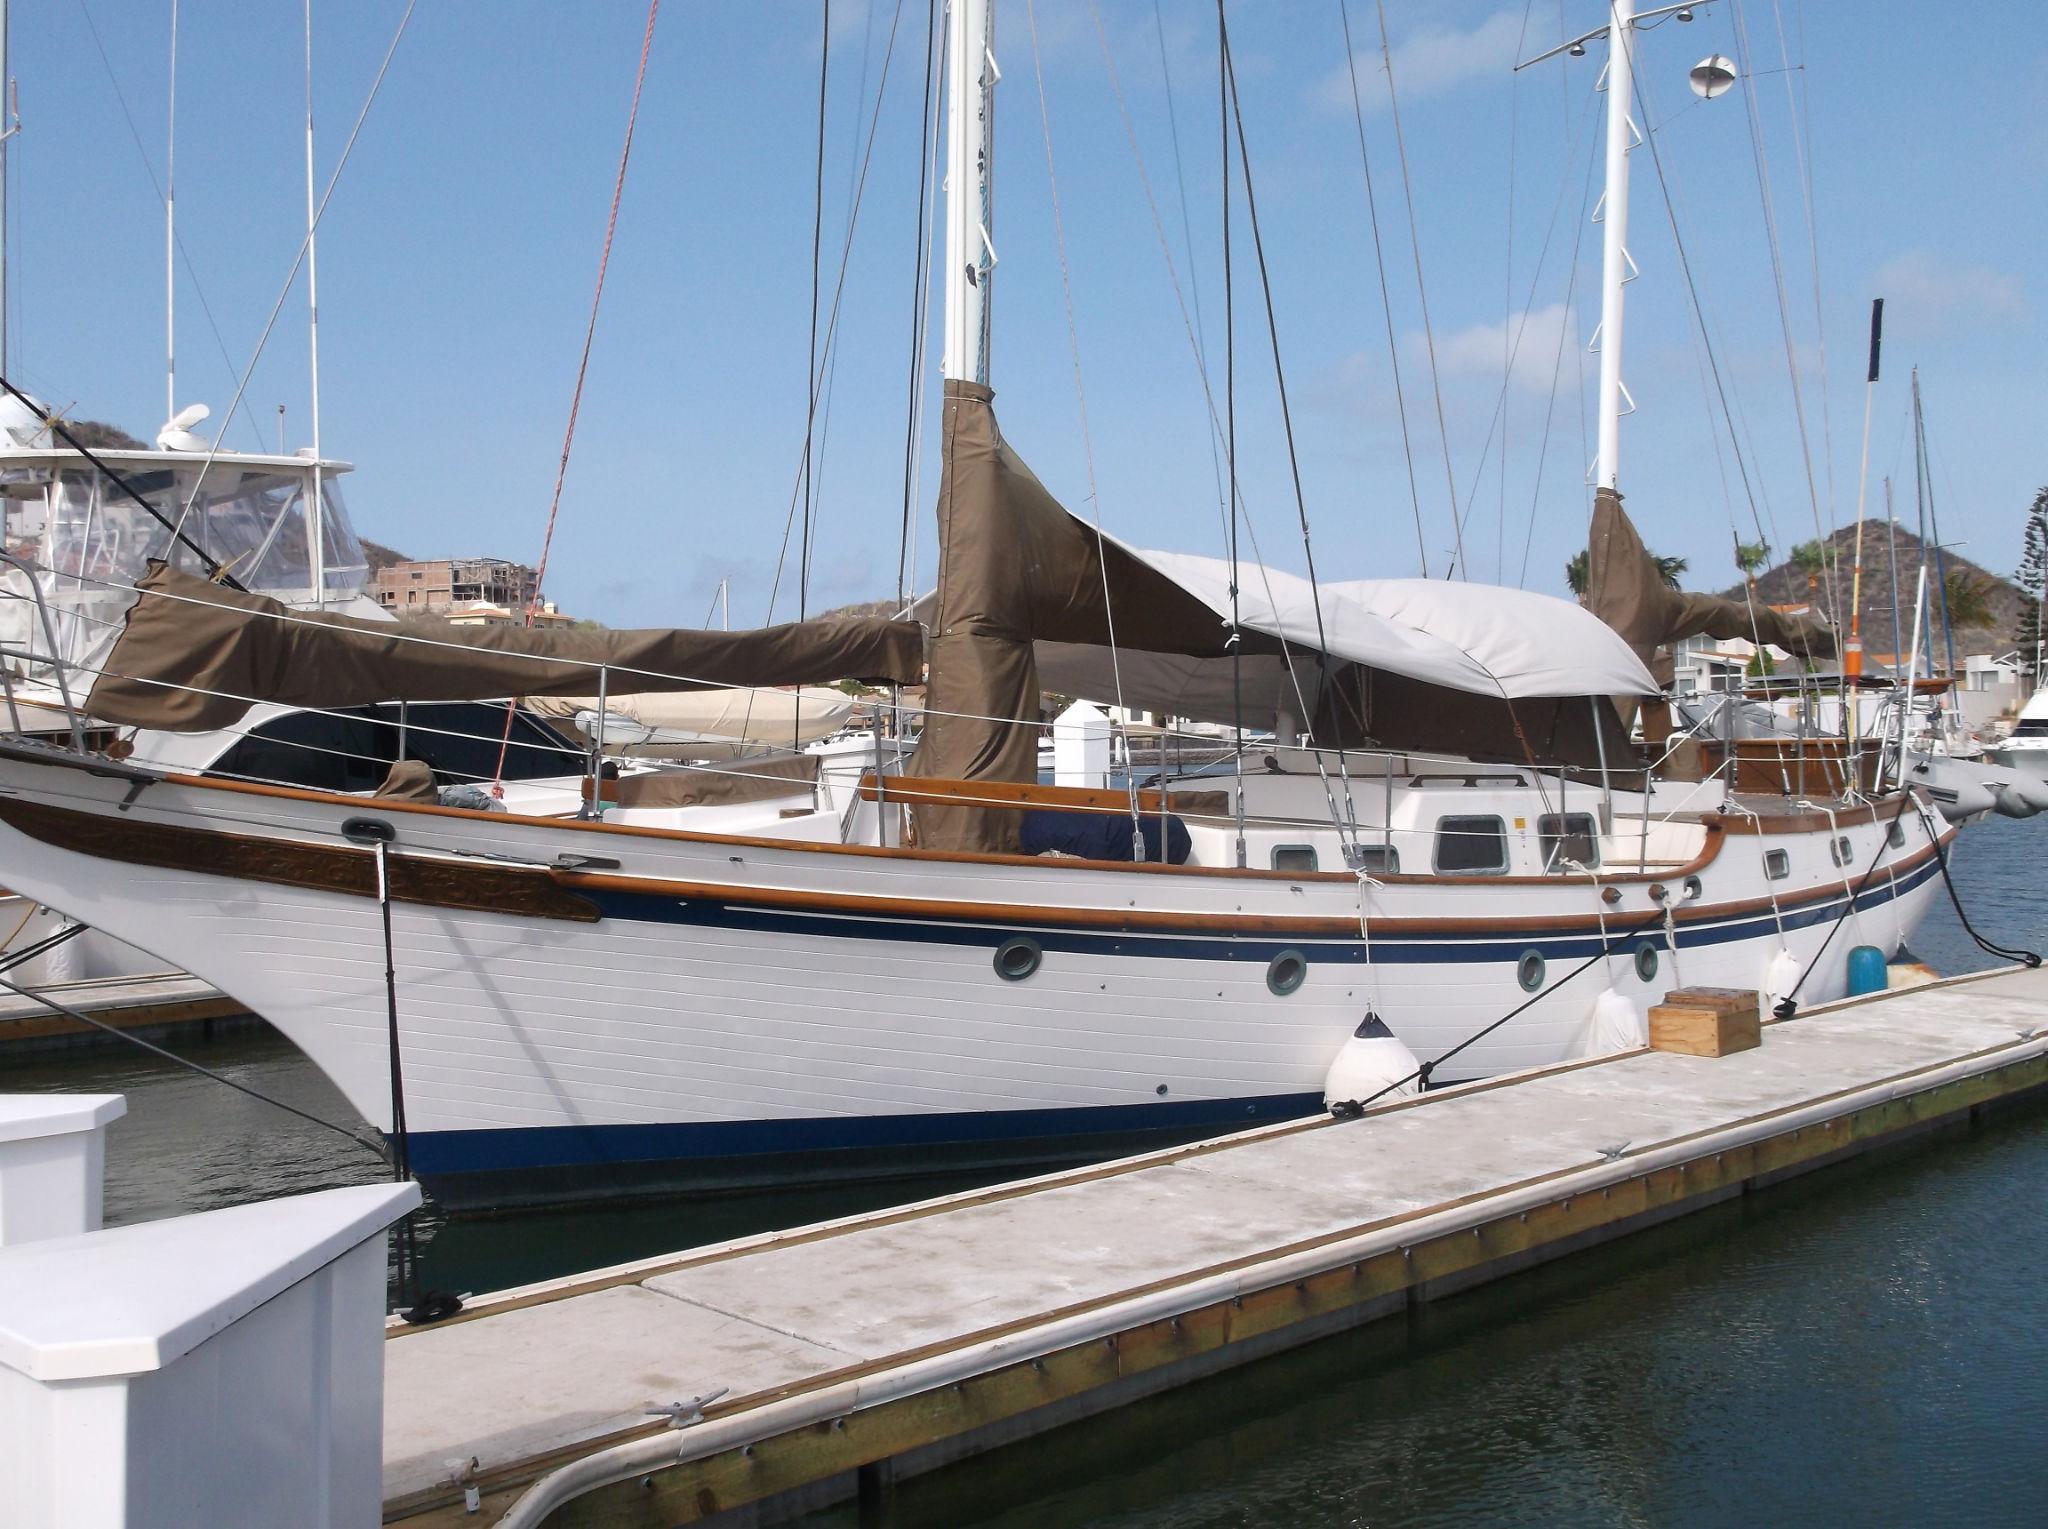 47' Vagabond Ketch+Boat for sale!